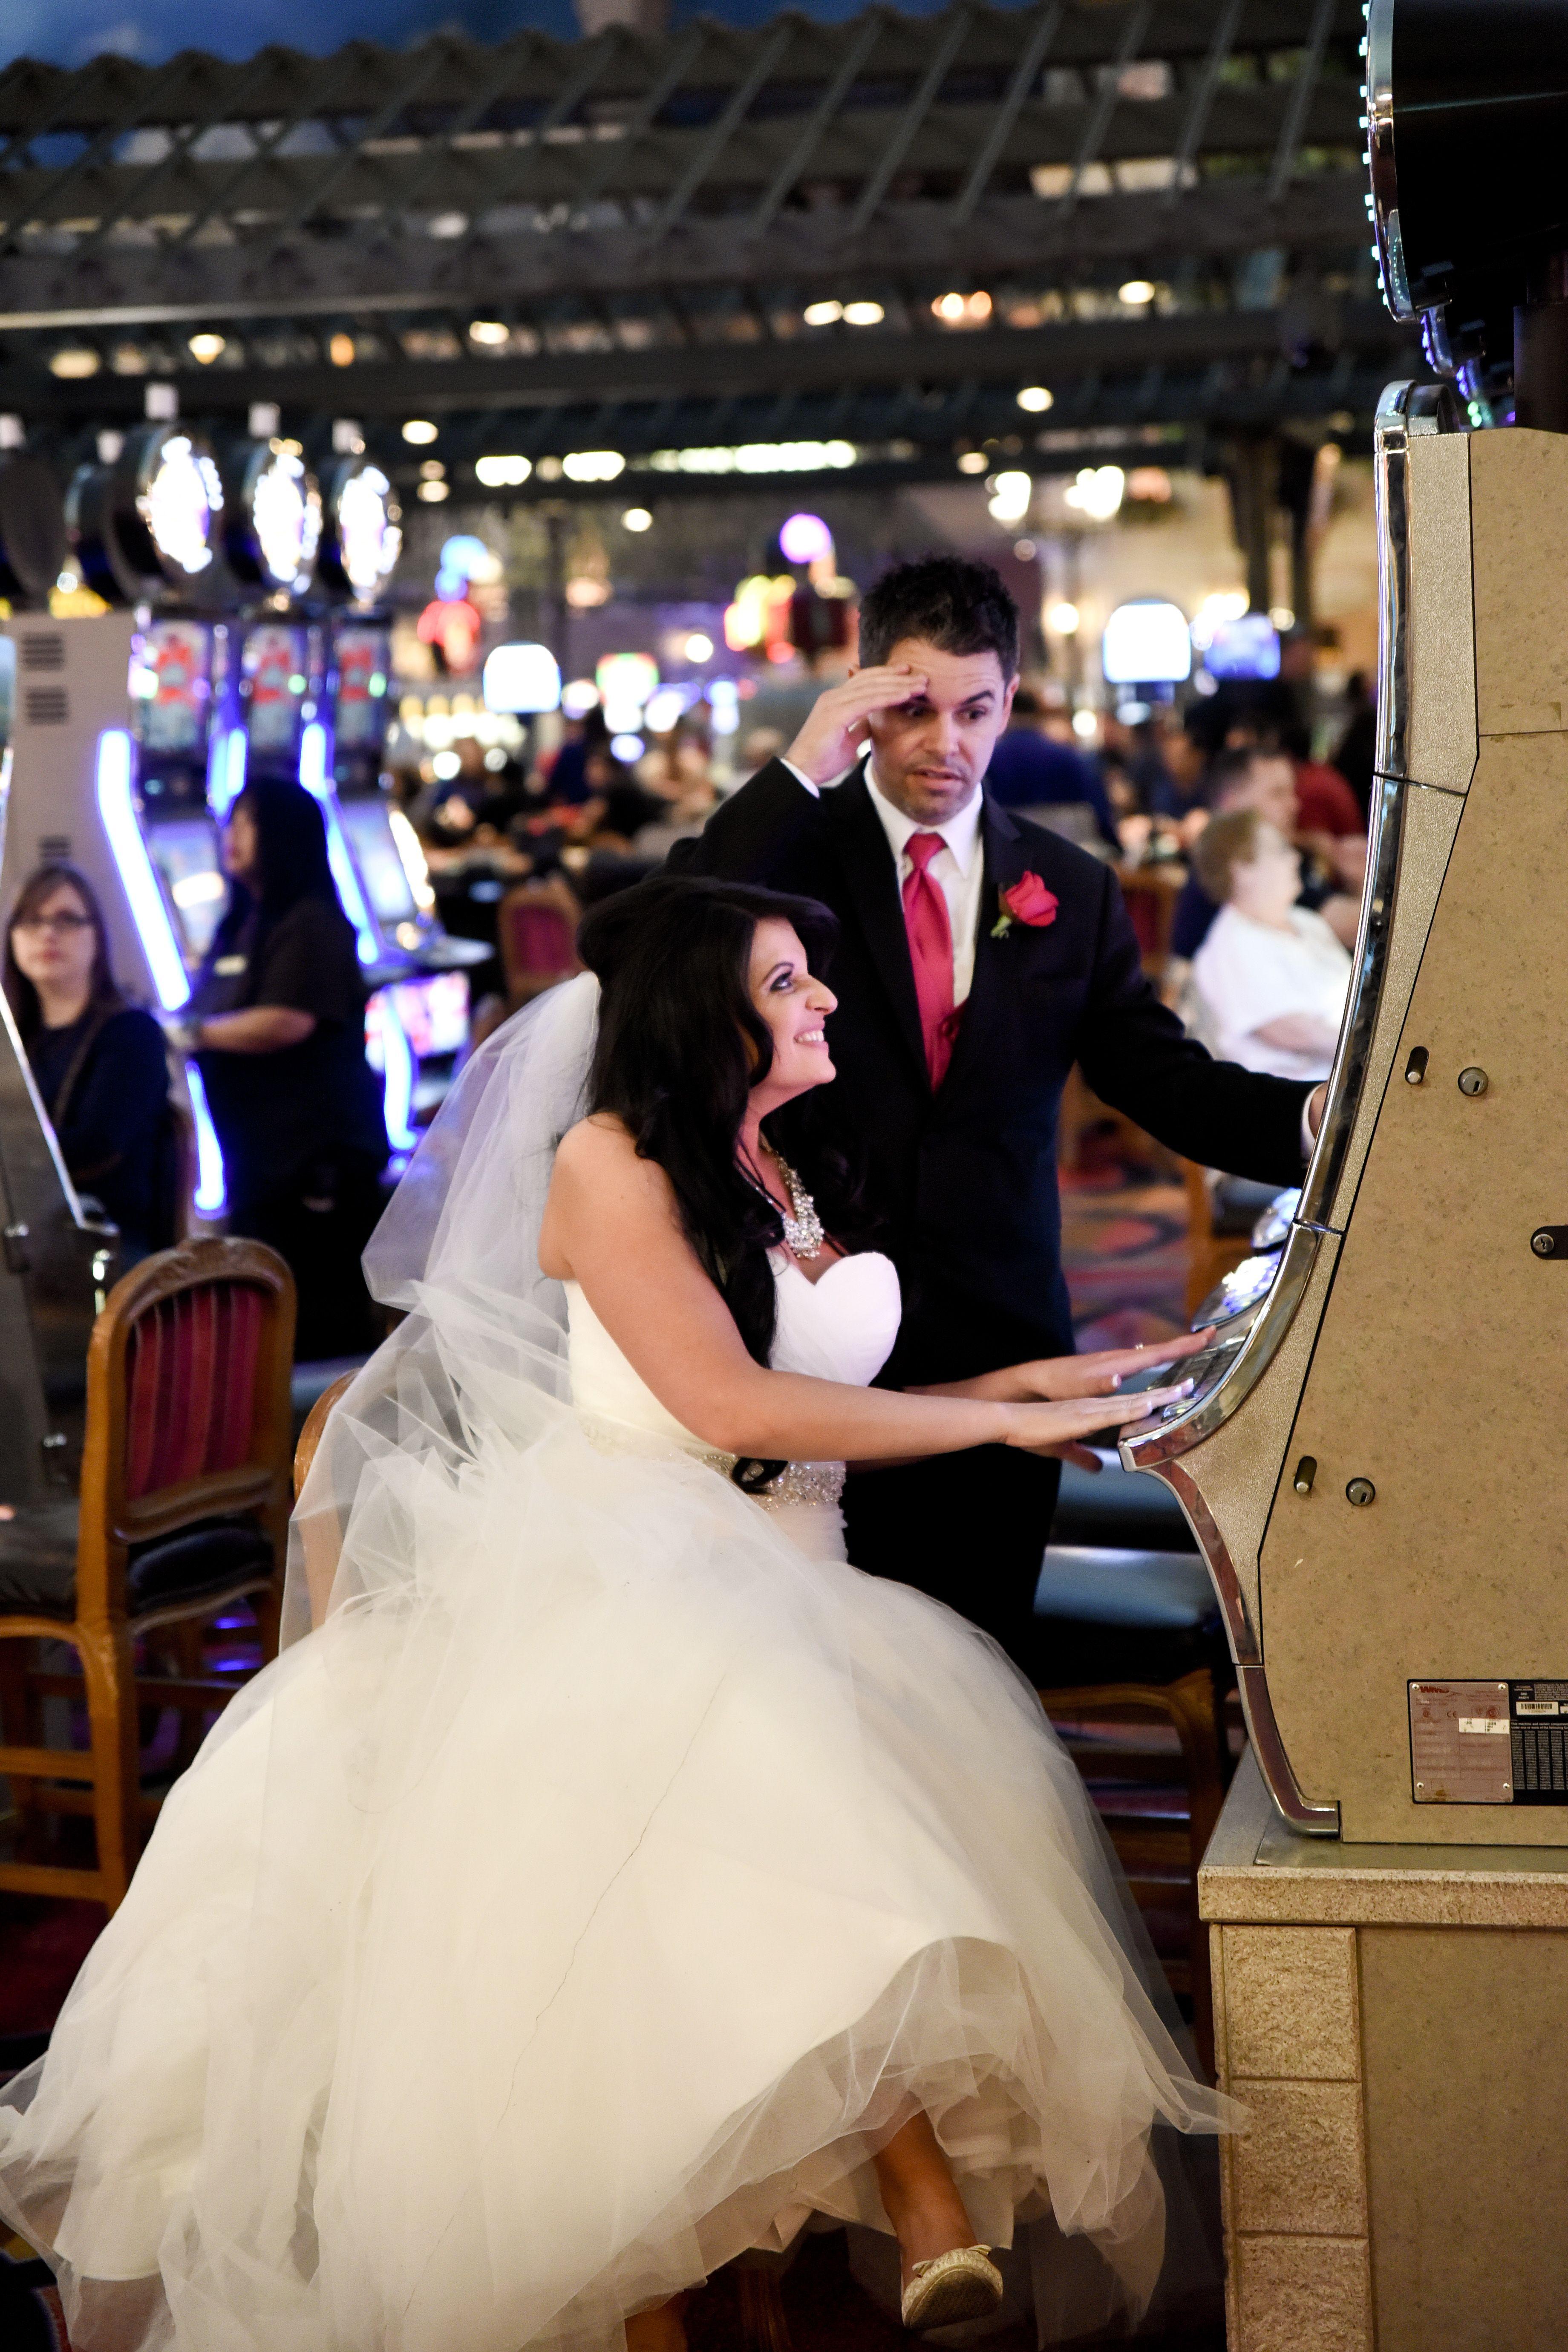 Funny Wedding Photo Ideas Vegas Themed Weddings Vegas Wedding Ideas Vegas Wedding Photos Elvis Wedding Las Vegas Wedding Photos